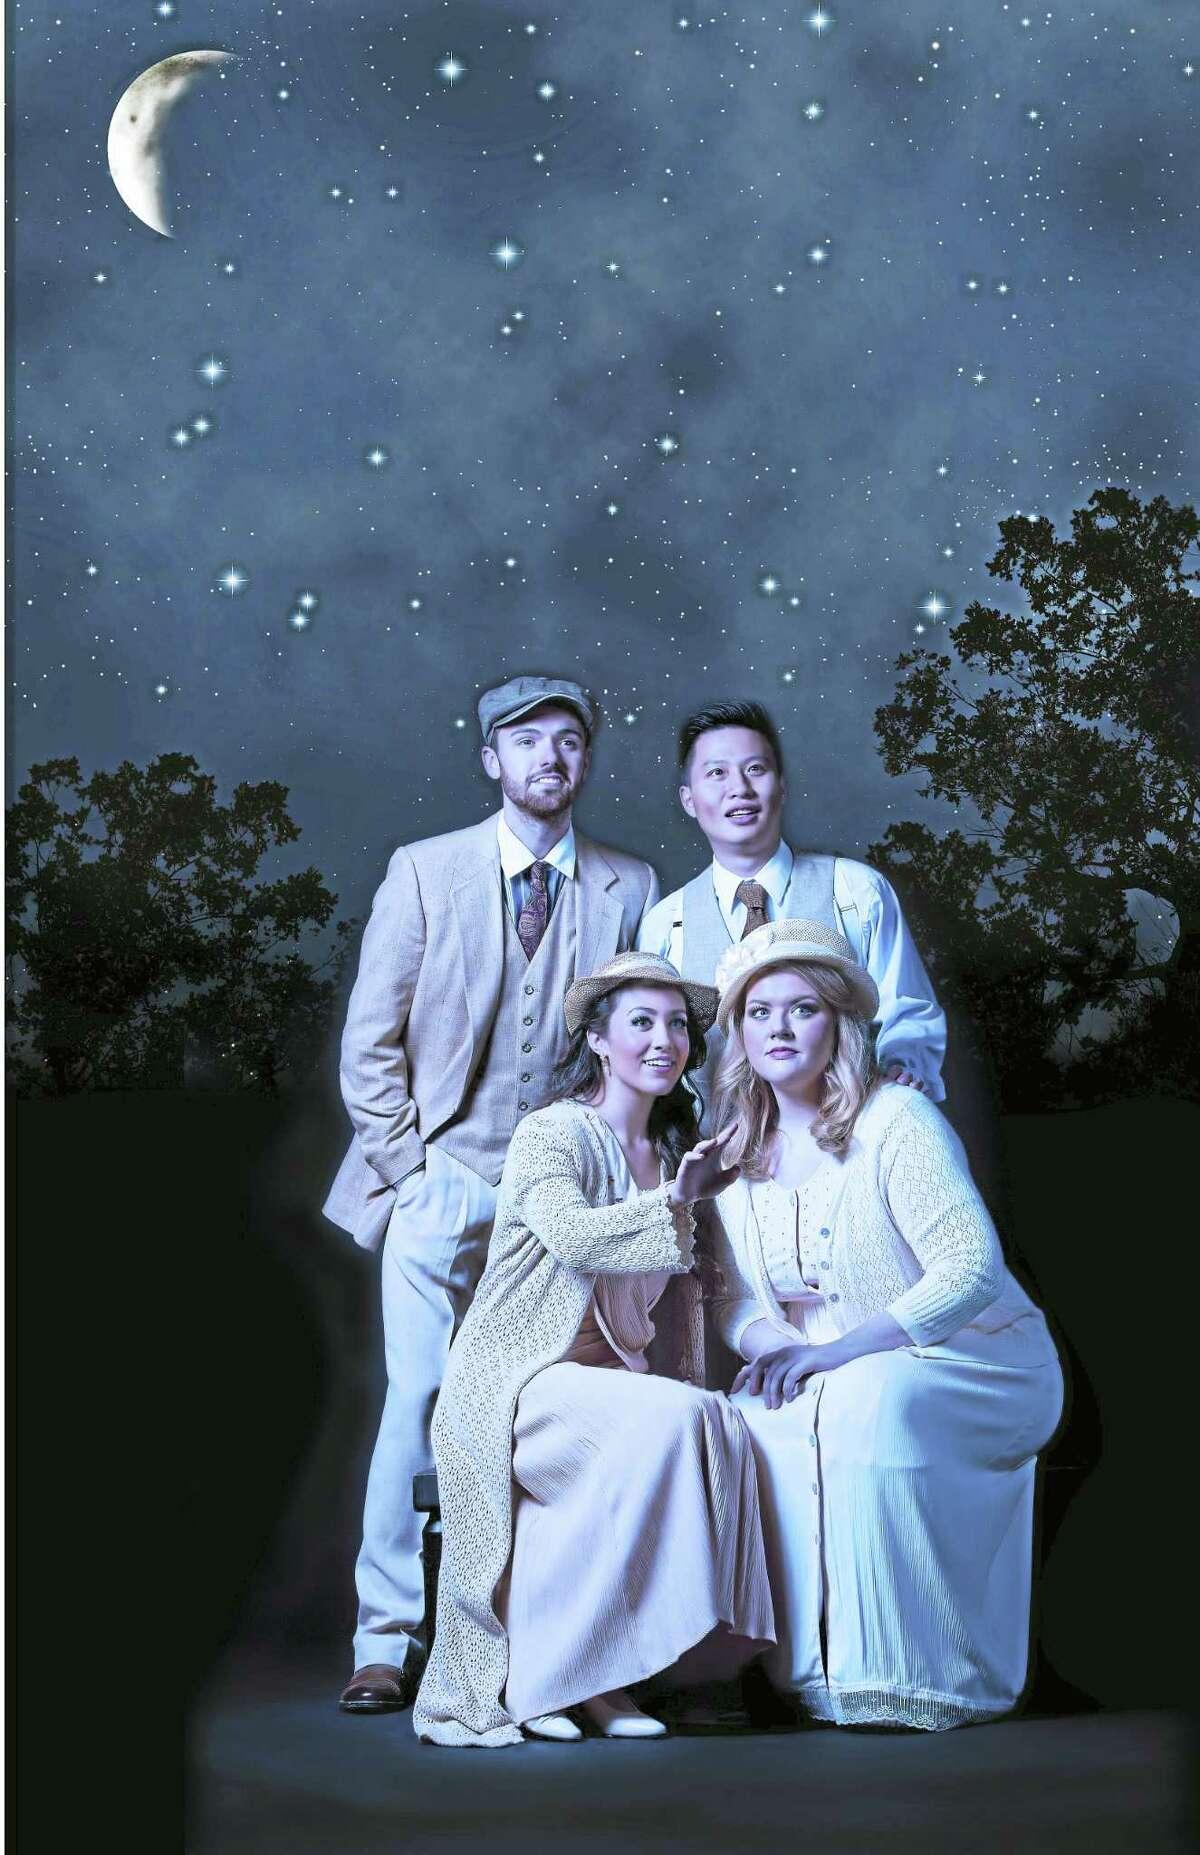 Front, Jessica Pray, soprano, as Helena, and Kathleen Reveille, mezzo-soprano, as Hermia. Rear, Dean Murphy, baritone, as Demetrius and Ting Li, tenor, as Lysander.